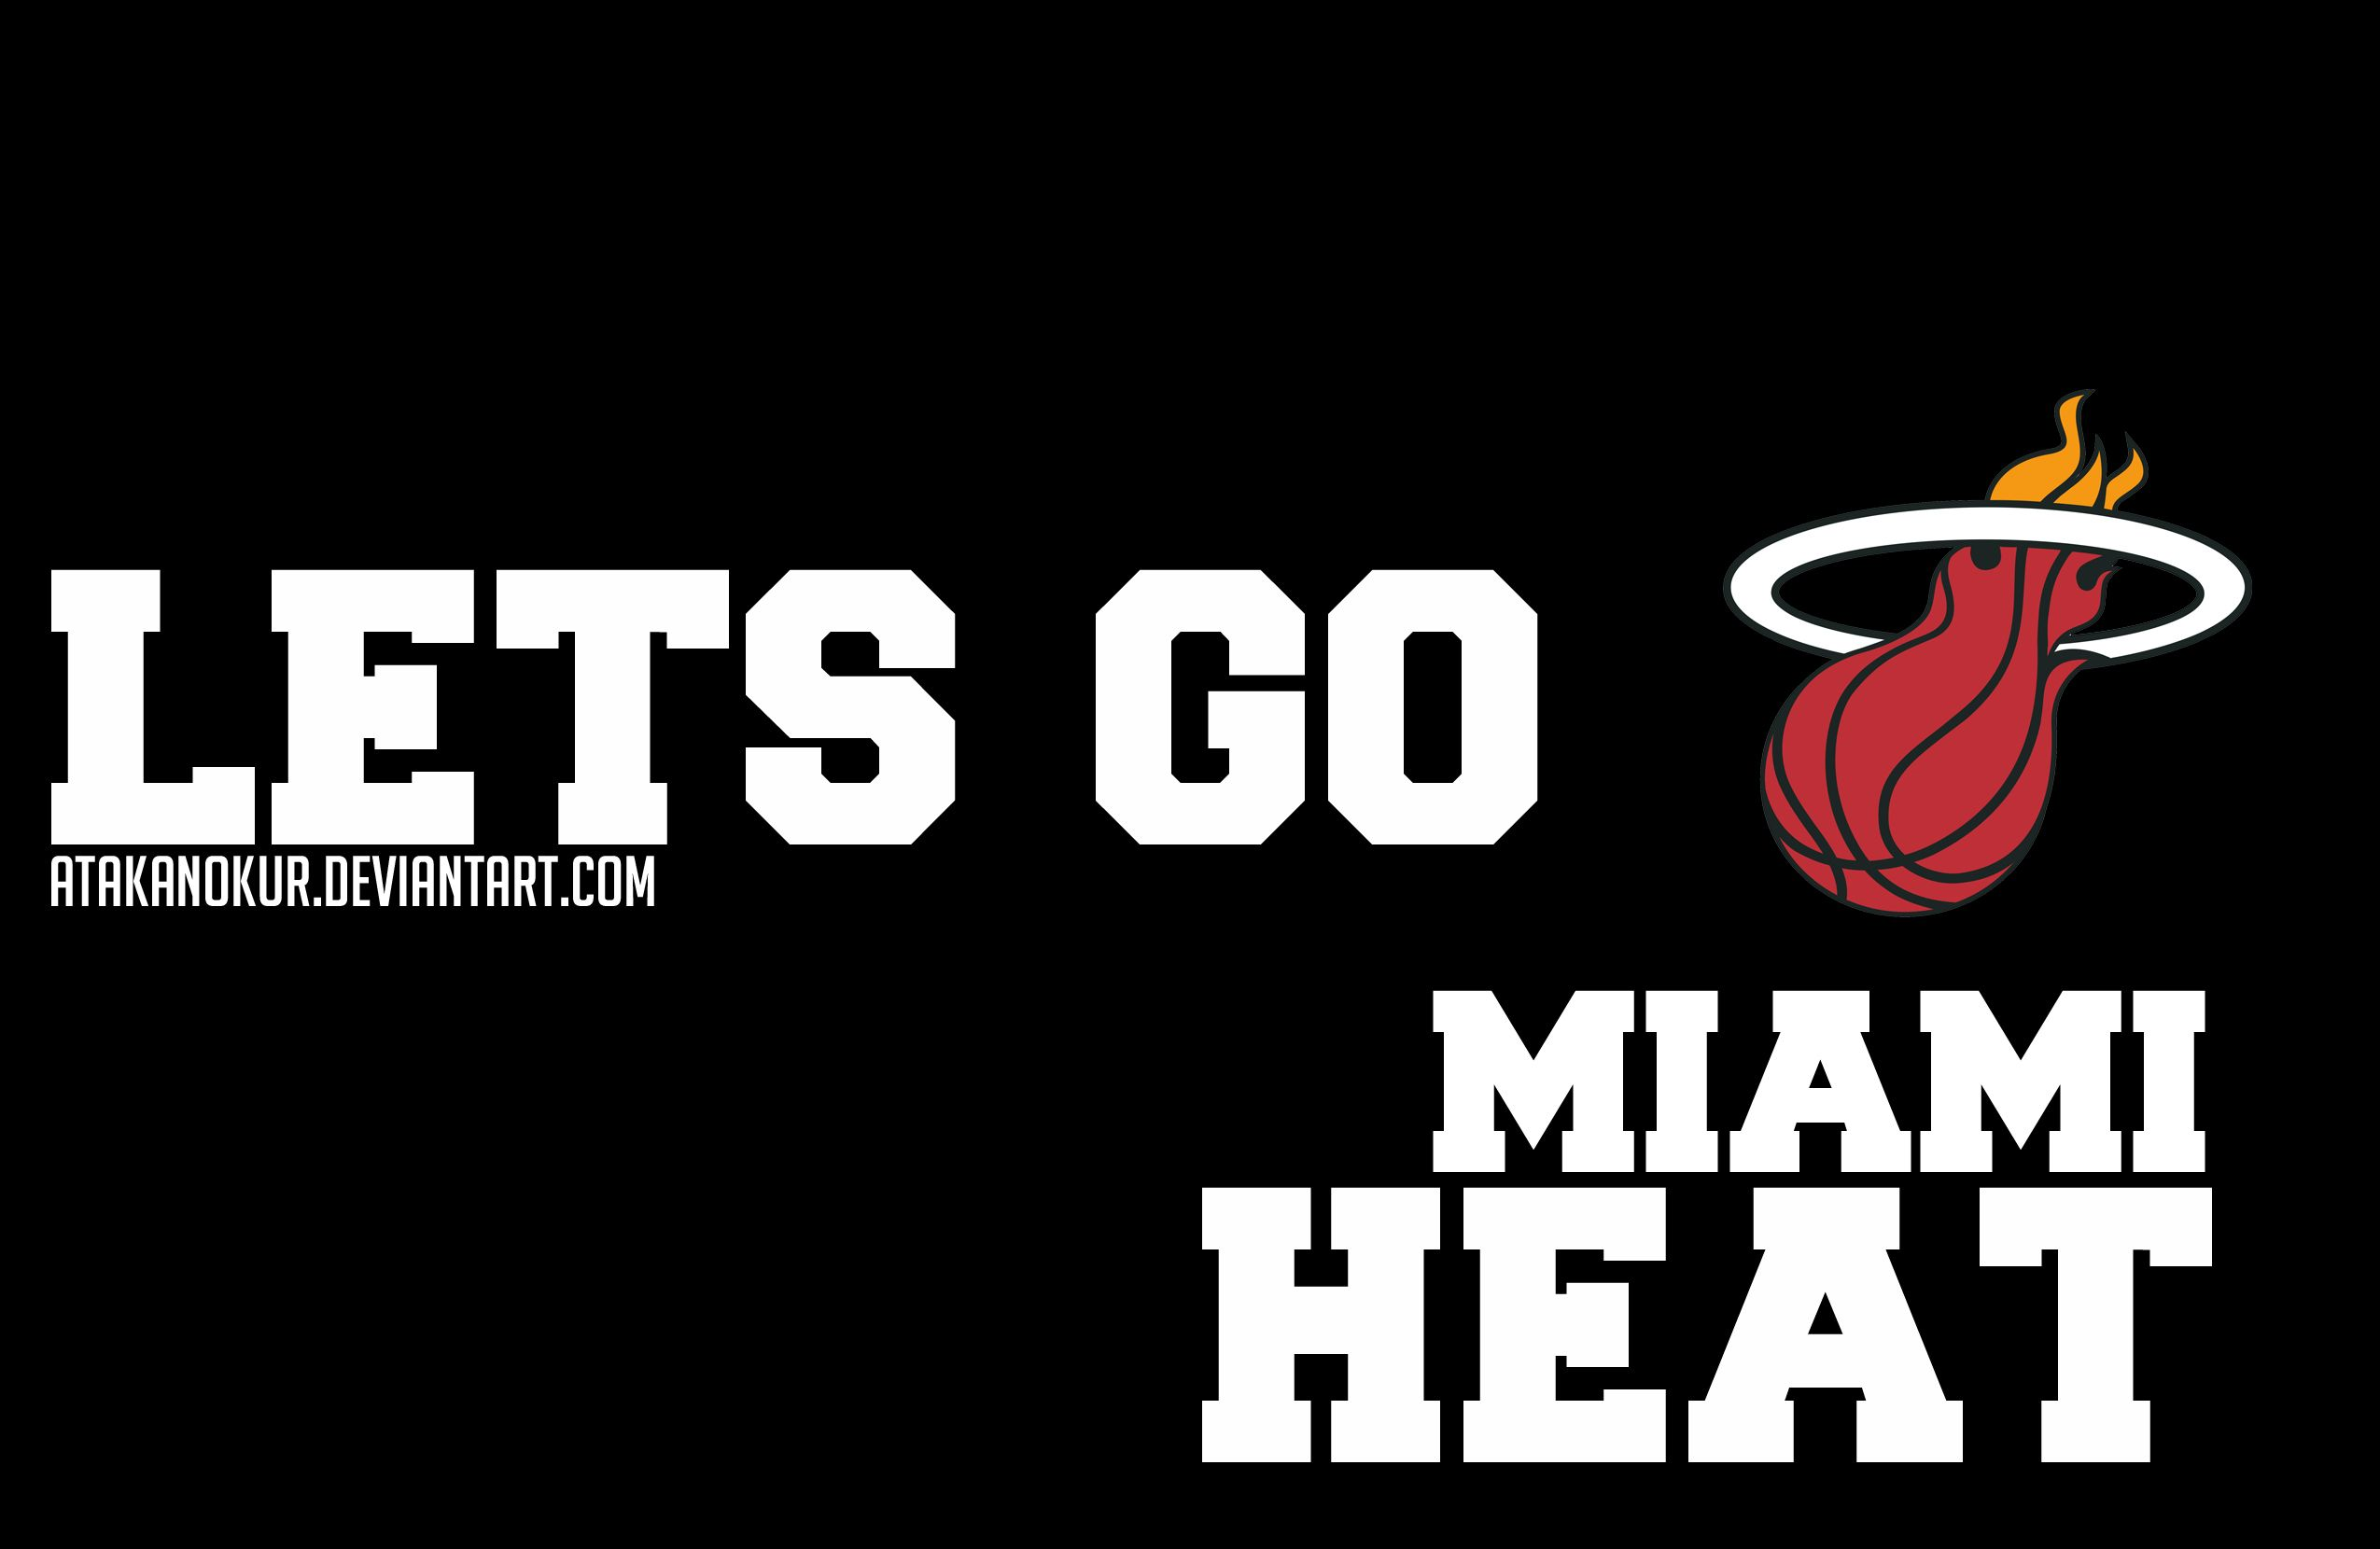 Miami Heat Wallpaper By Atakanokur On Deviantart Miami Heat Heat Nba Miami Heat